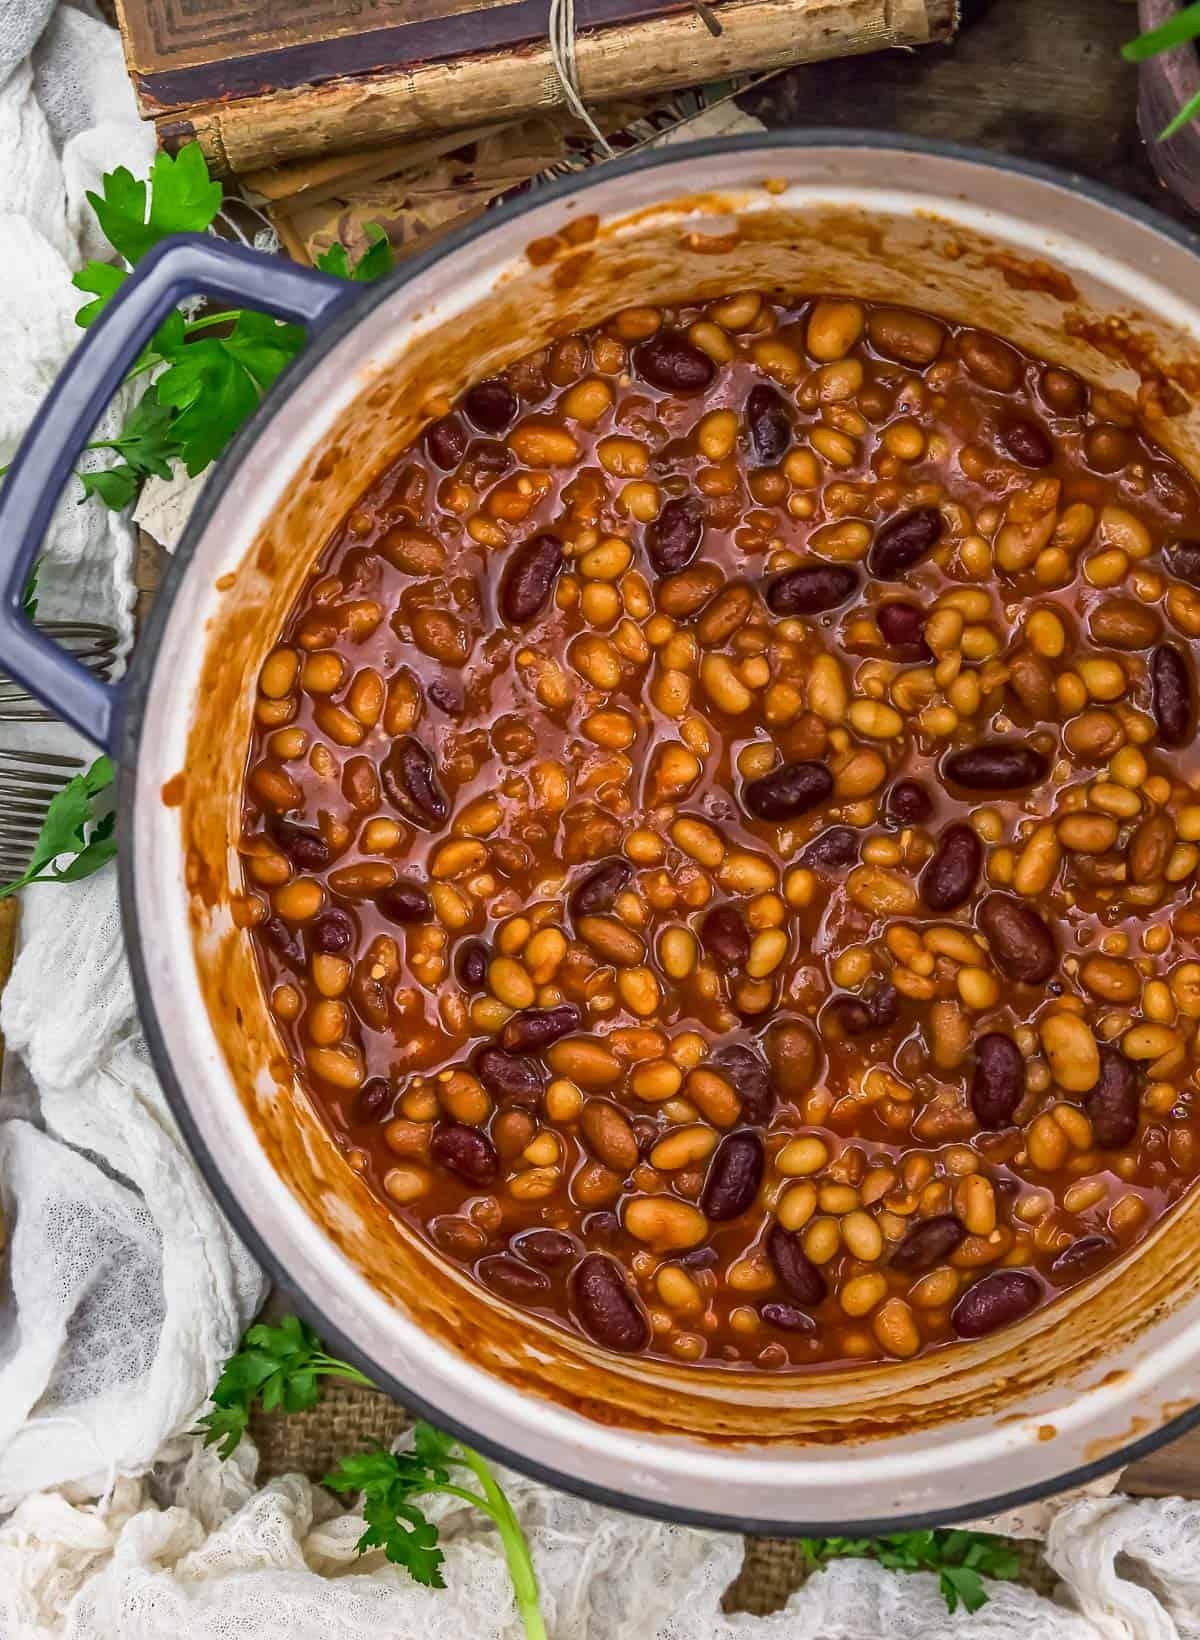 Pot of Vegan Baked Beans